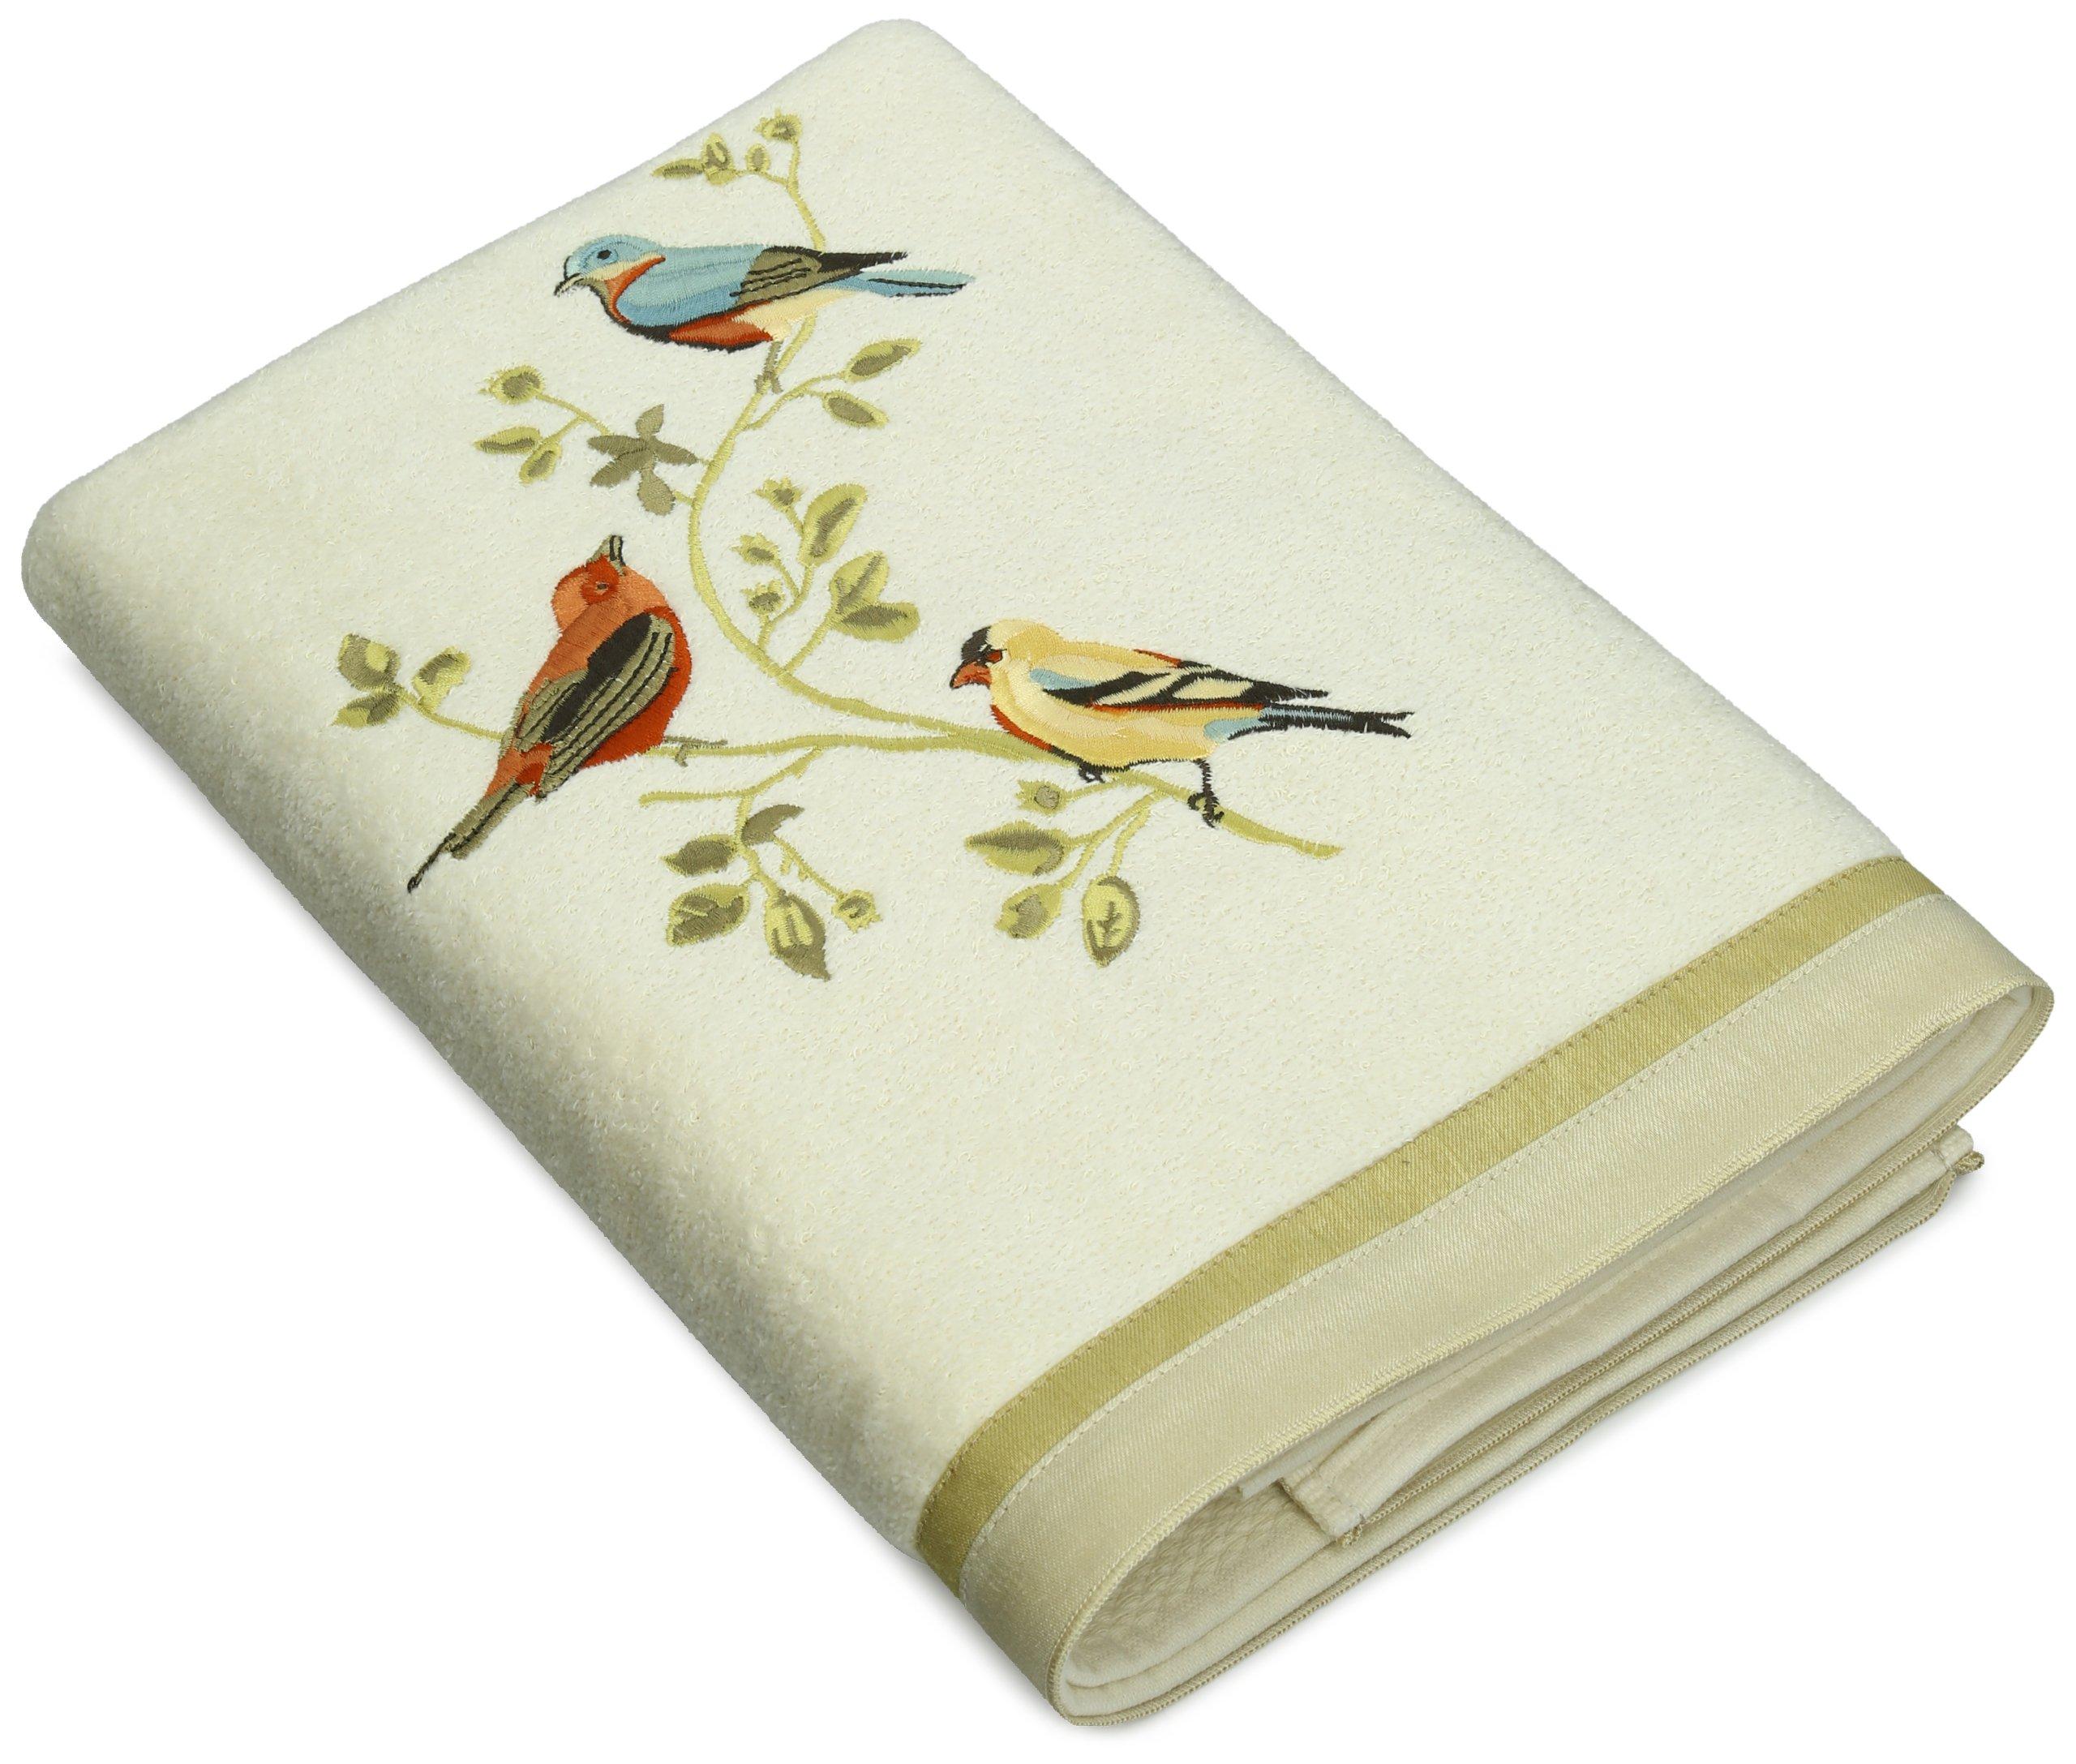 Avanti Linens Gilded Birds Bath Towel